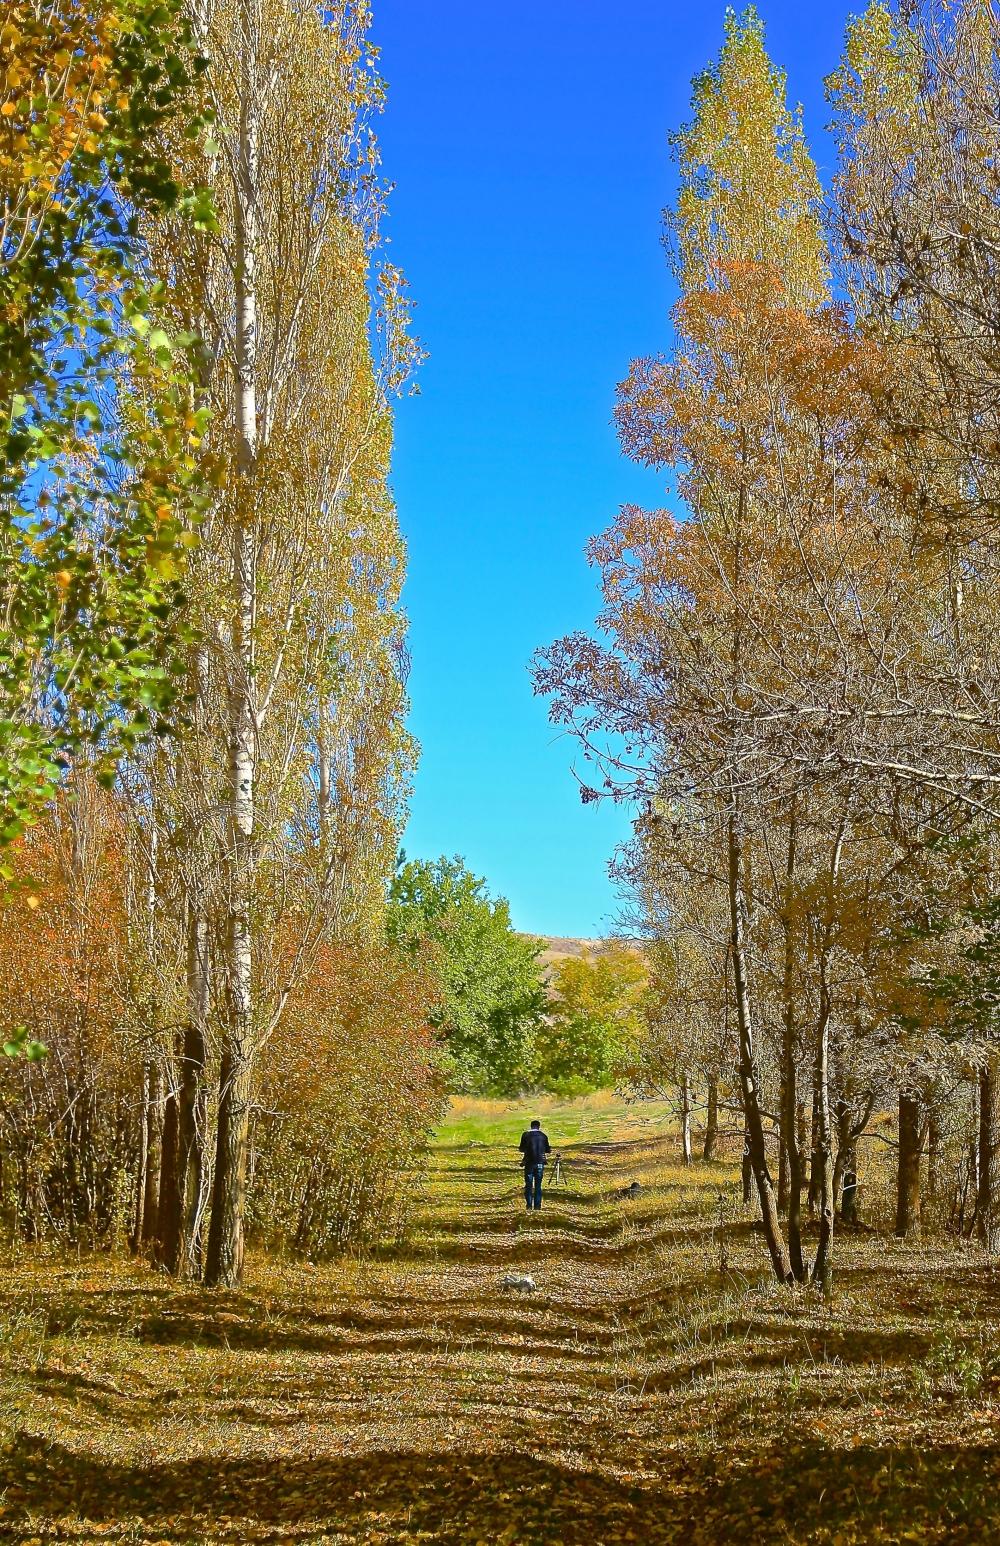 En güzel sonbahar enstanteleri 121